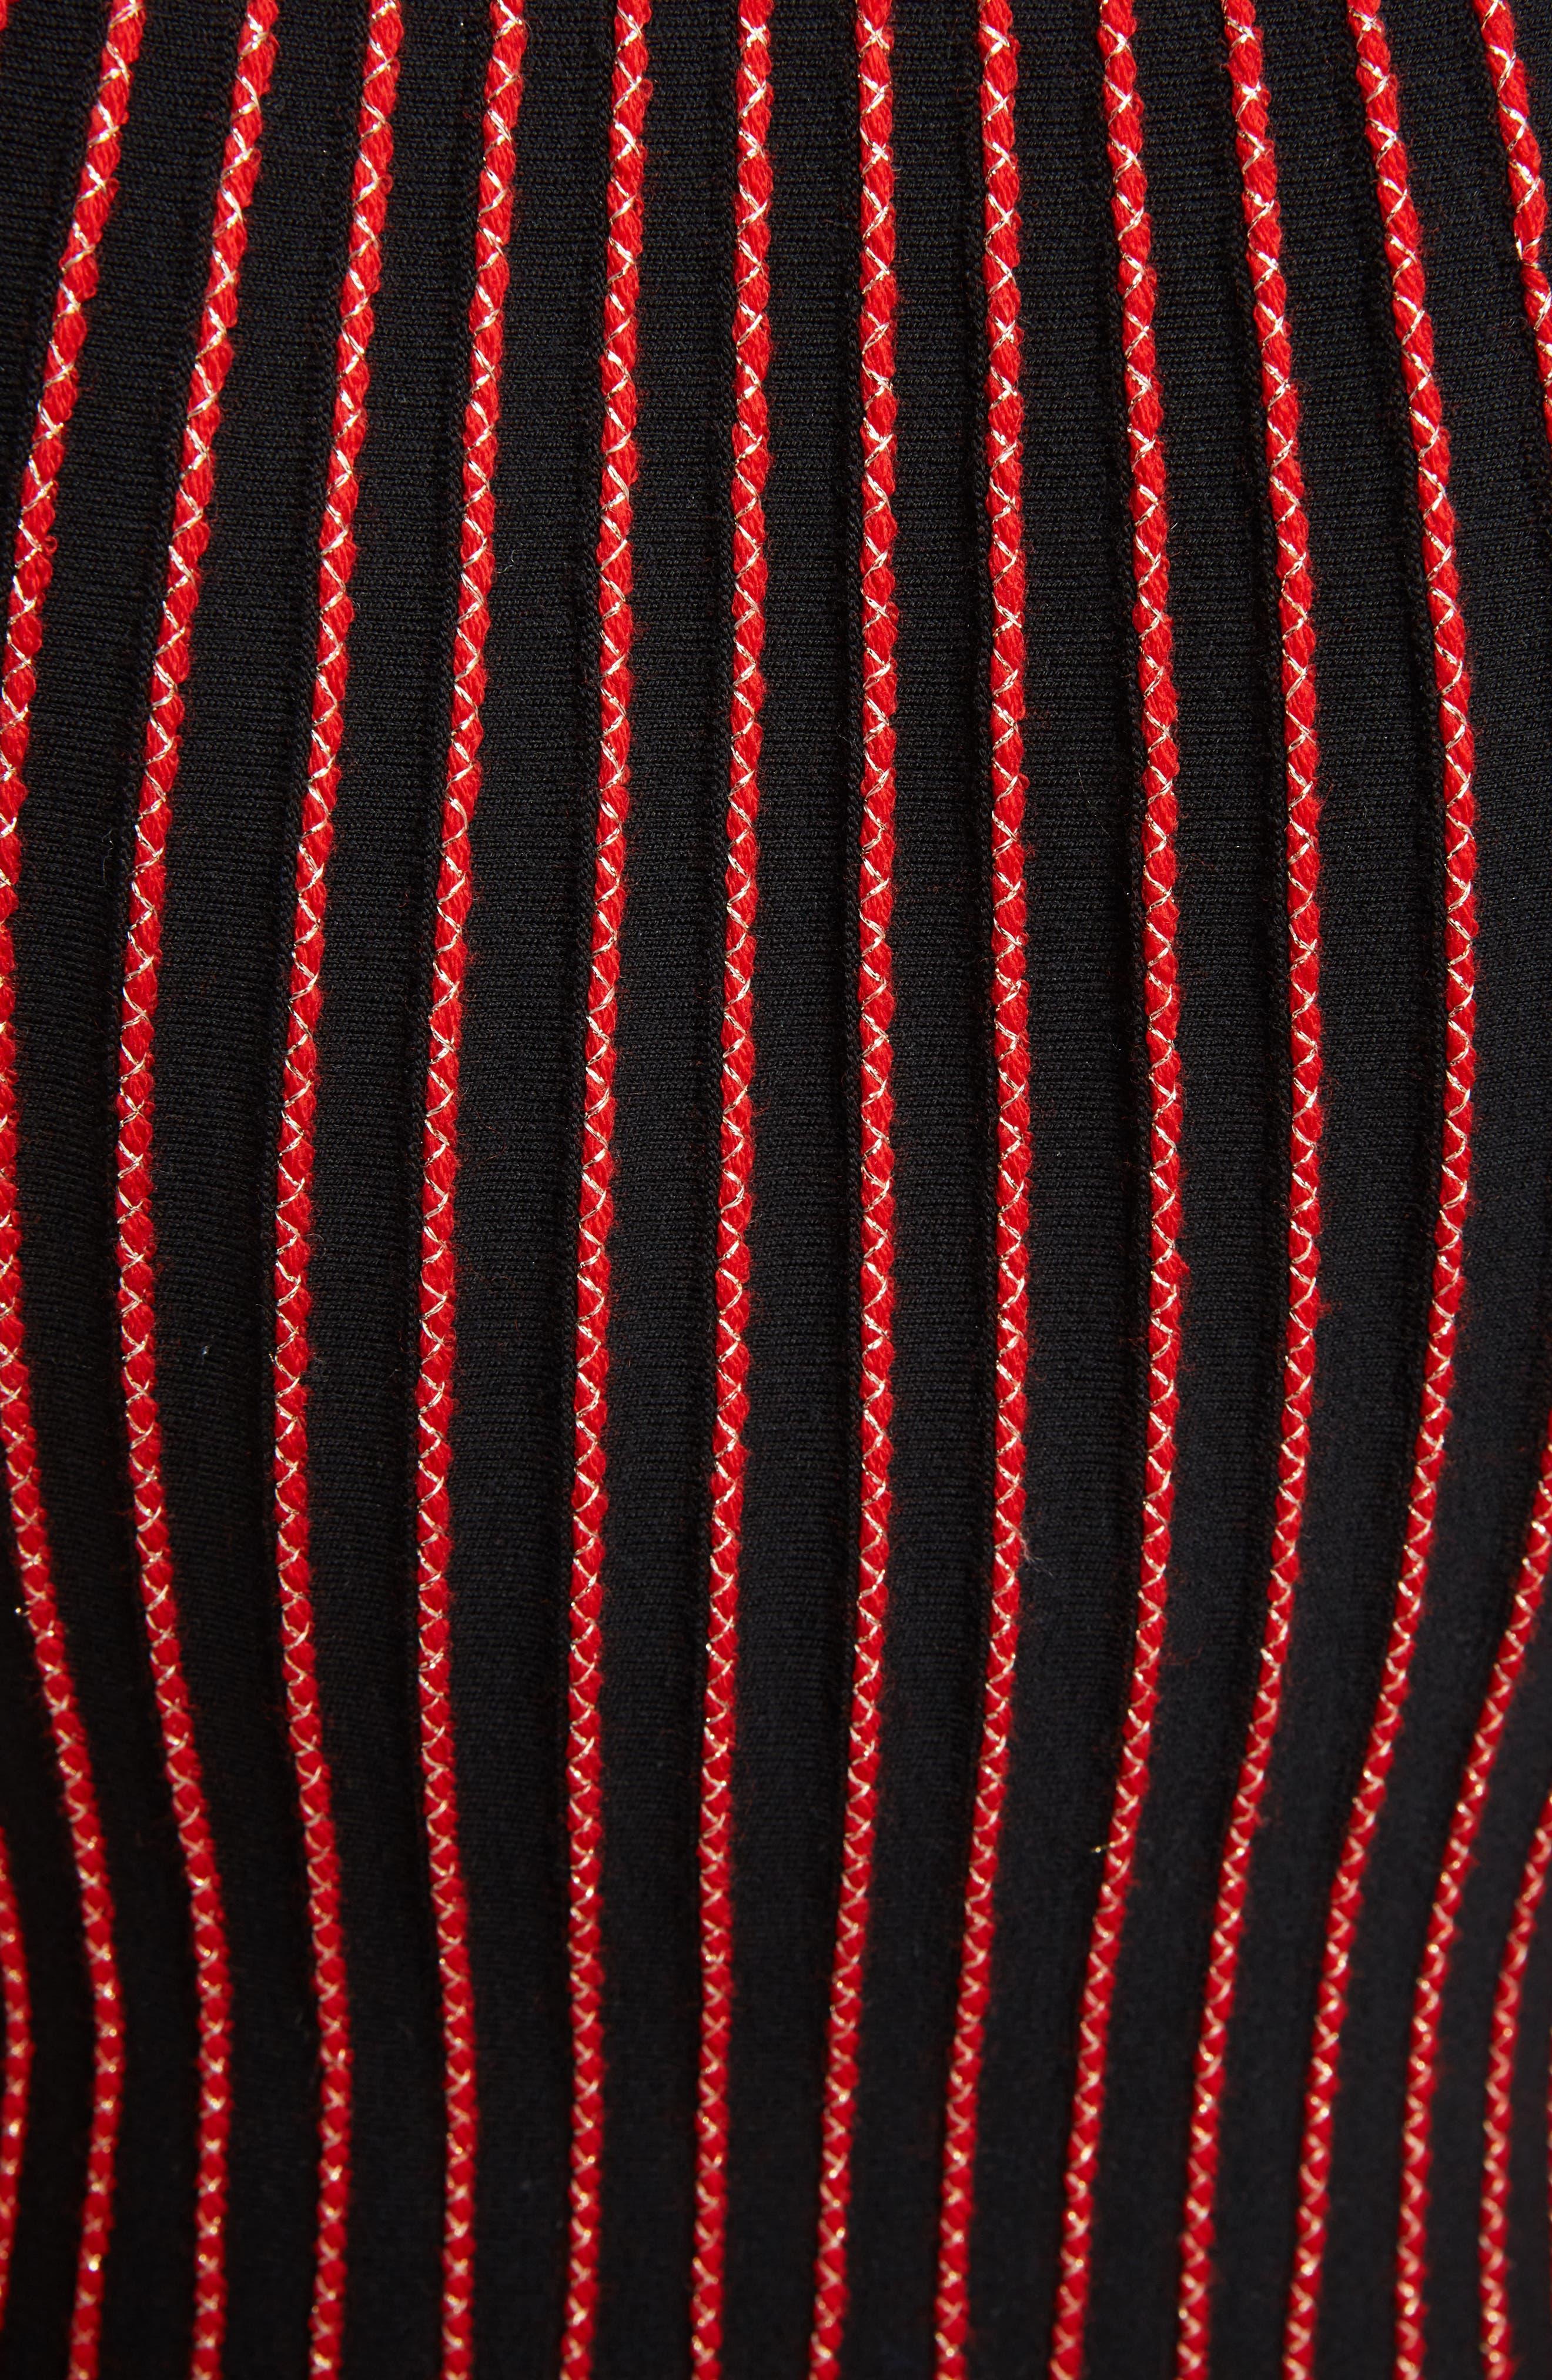 Metallic Wool Blend Pleat Dress,                             Alternate thumbnail 5, color,                             002